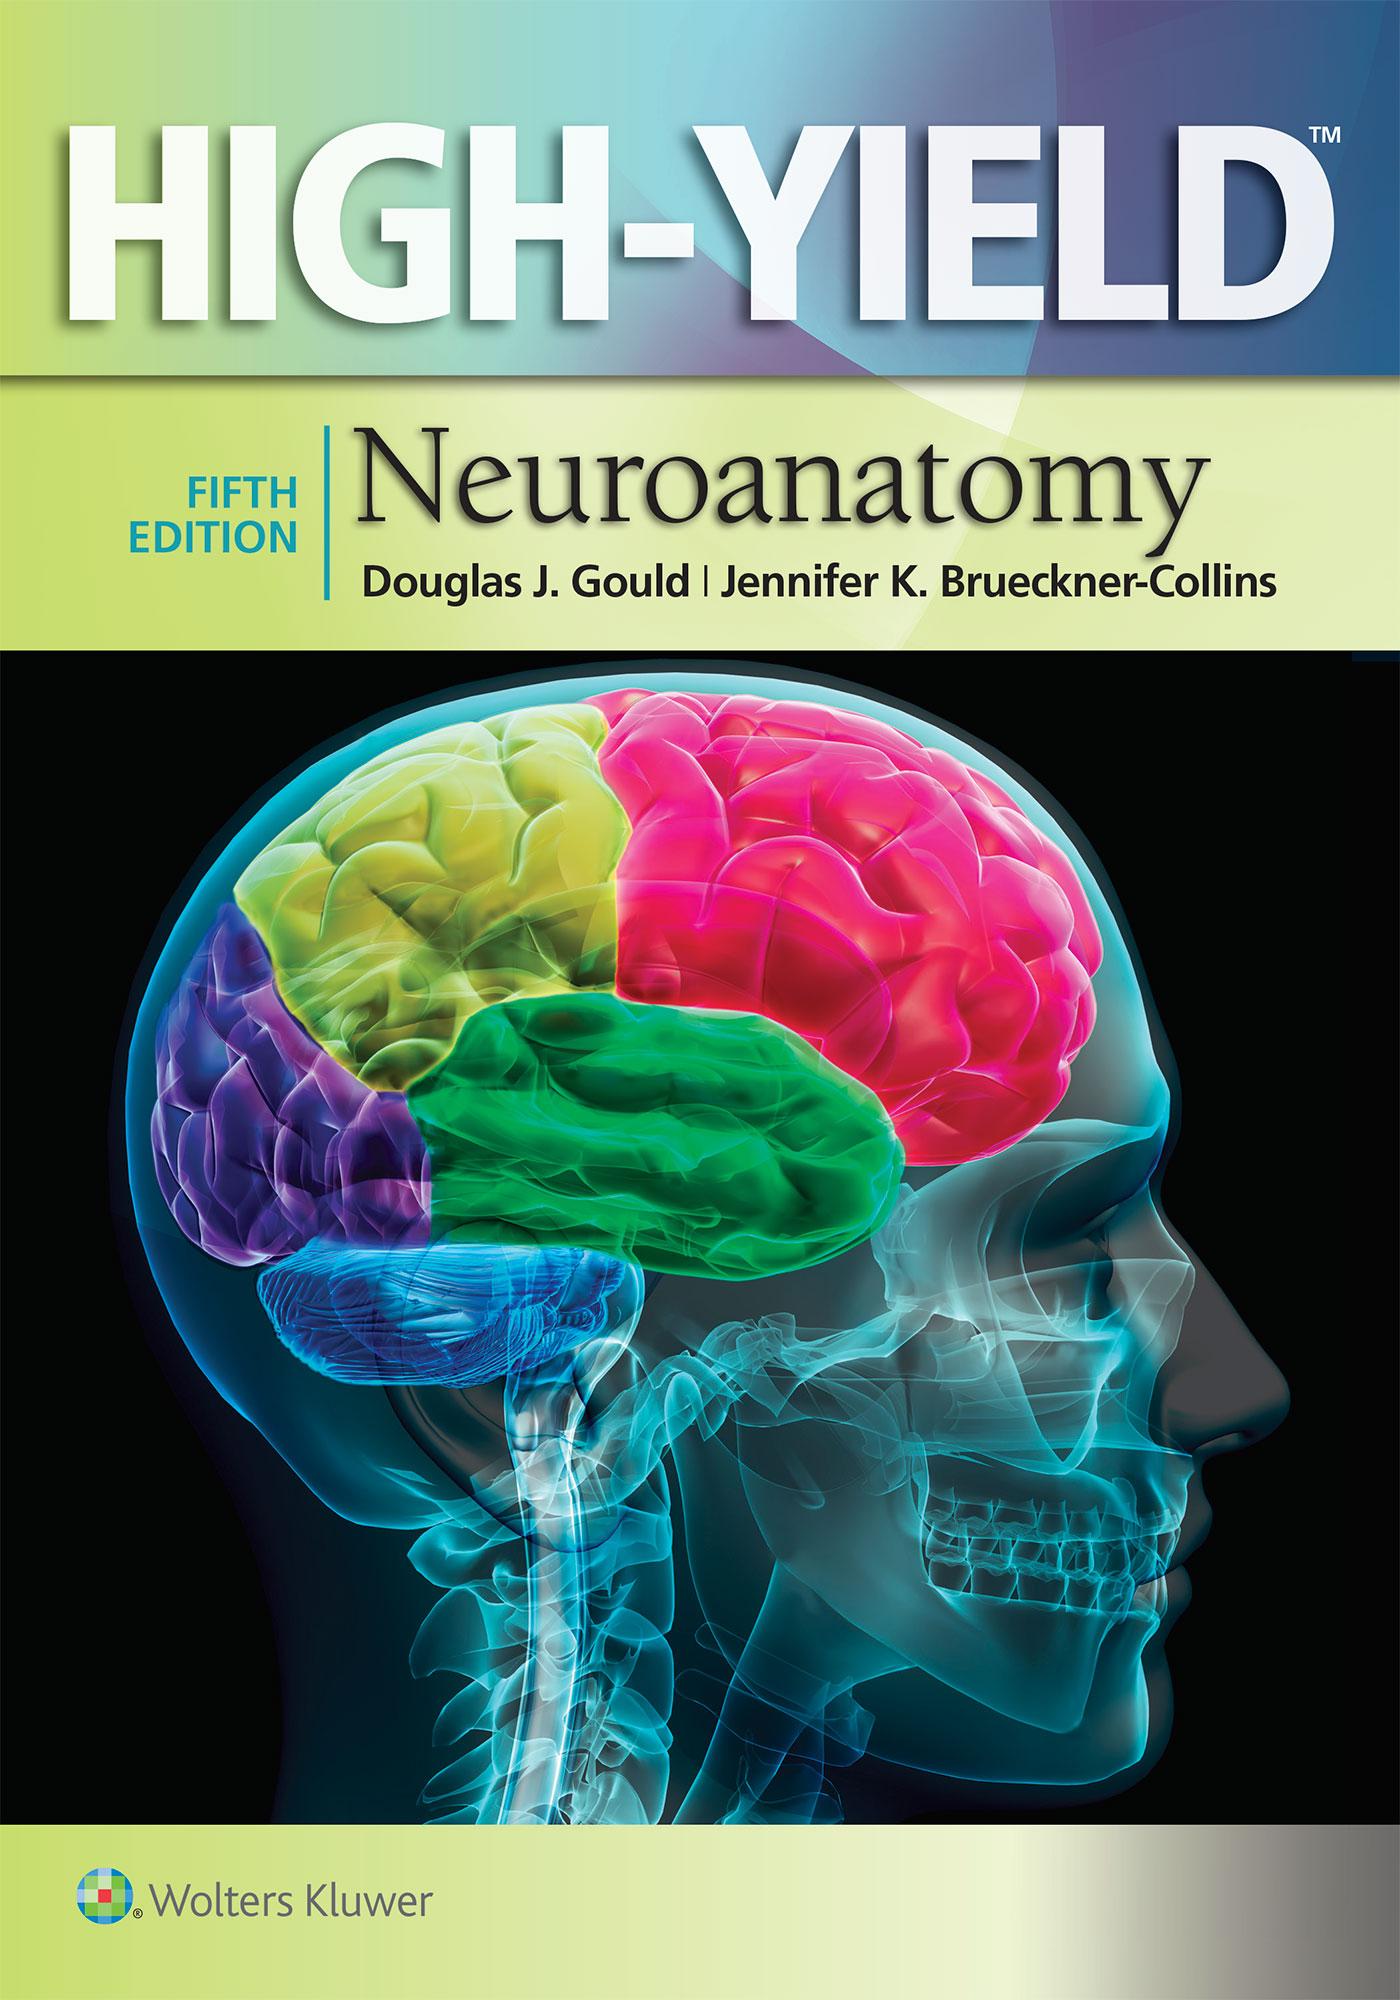 High-Yield Neuroanatomy